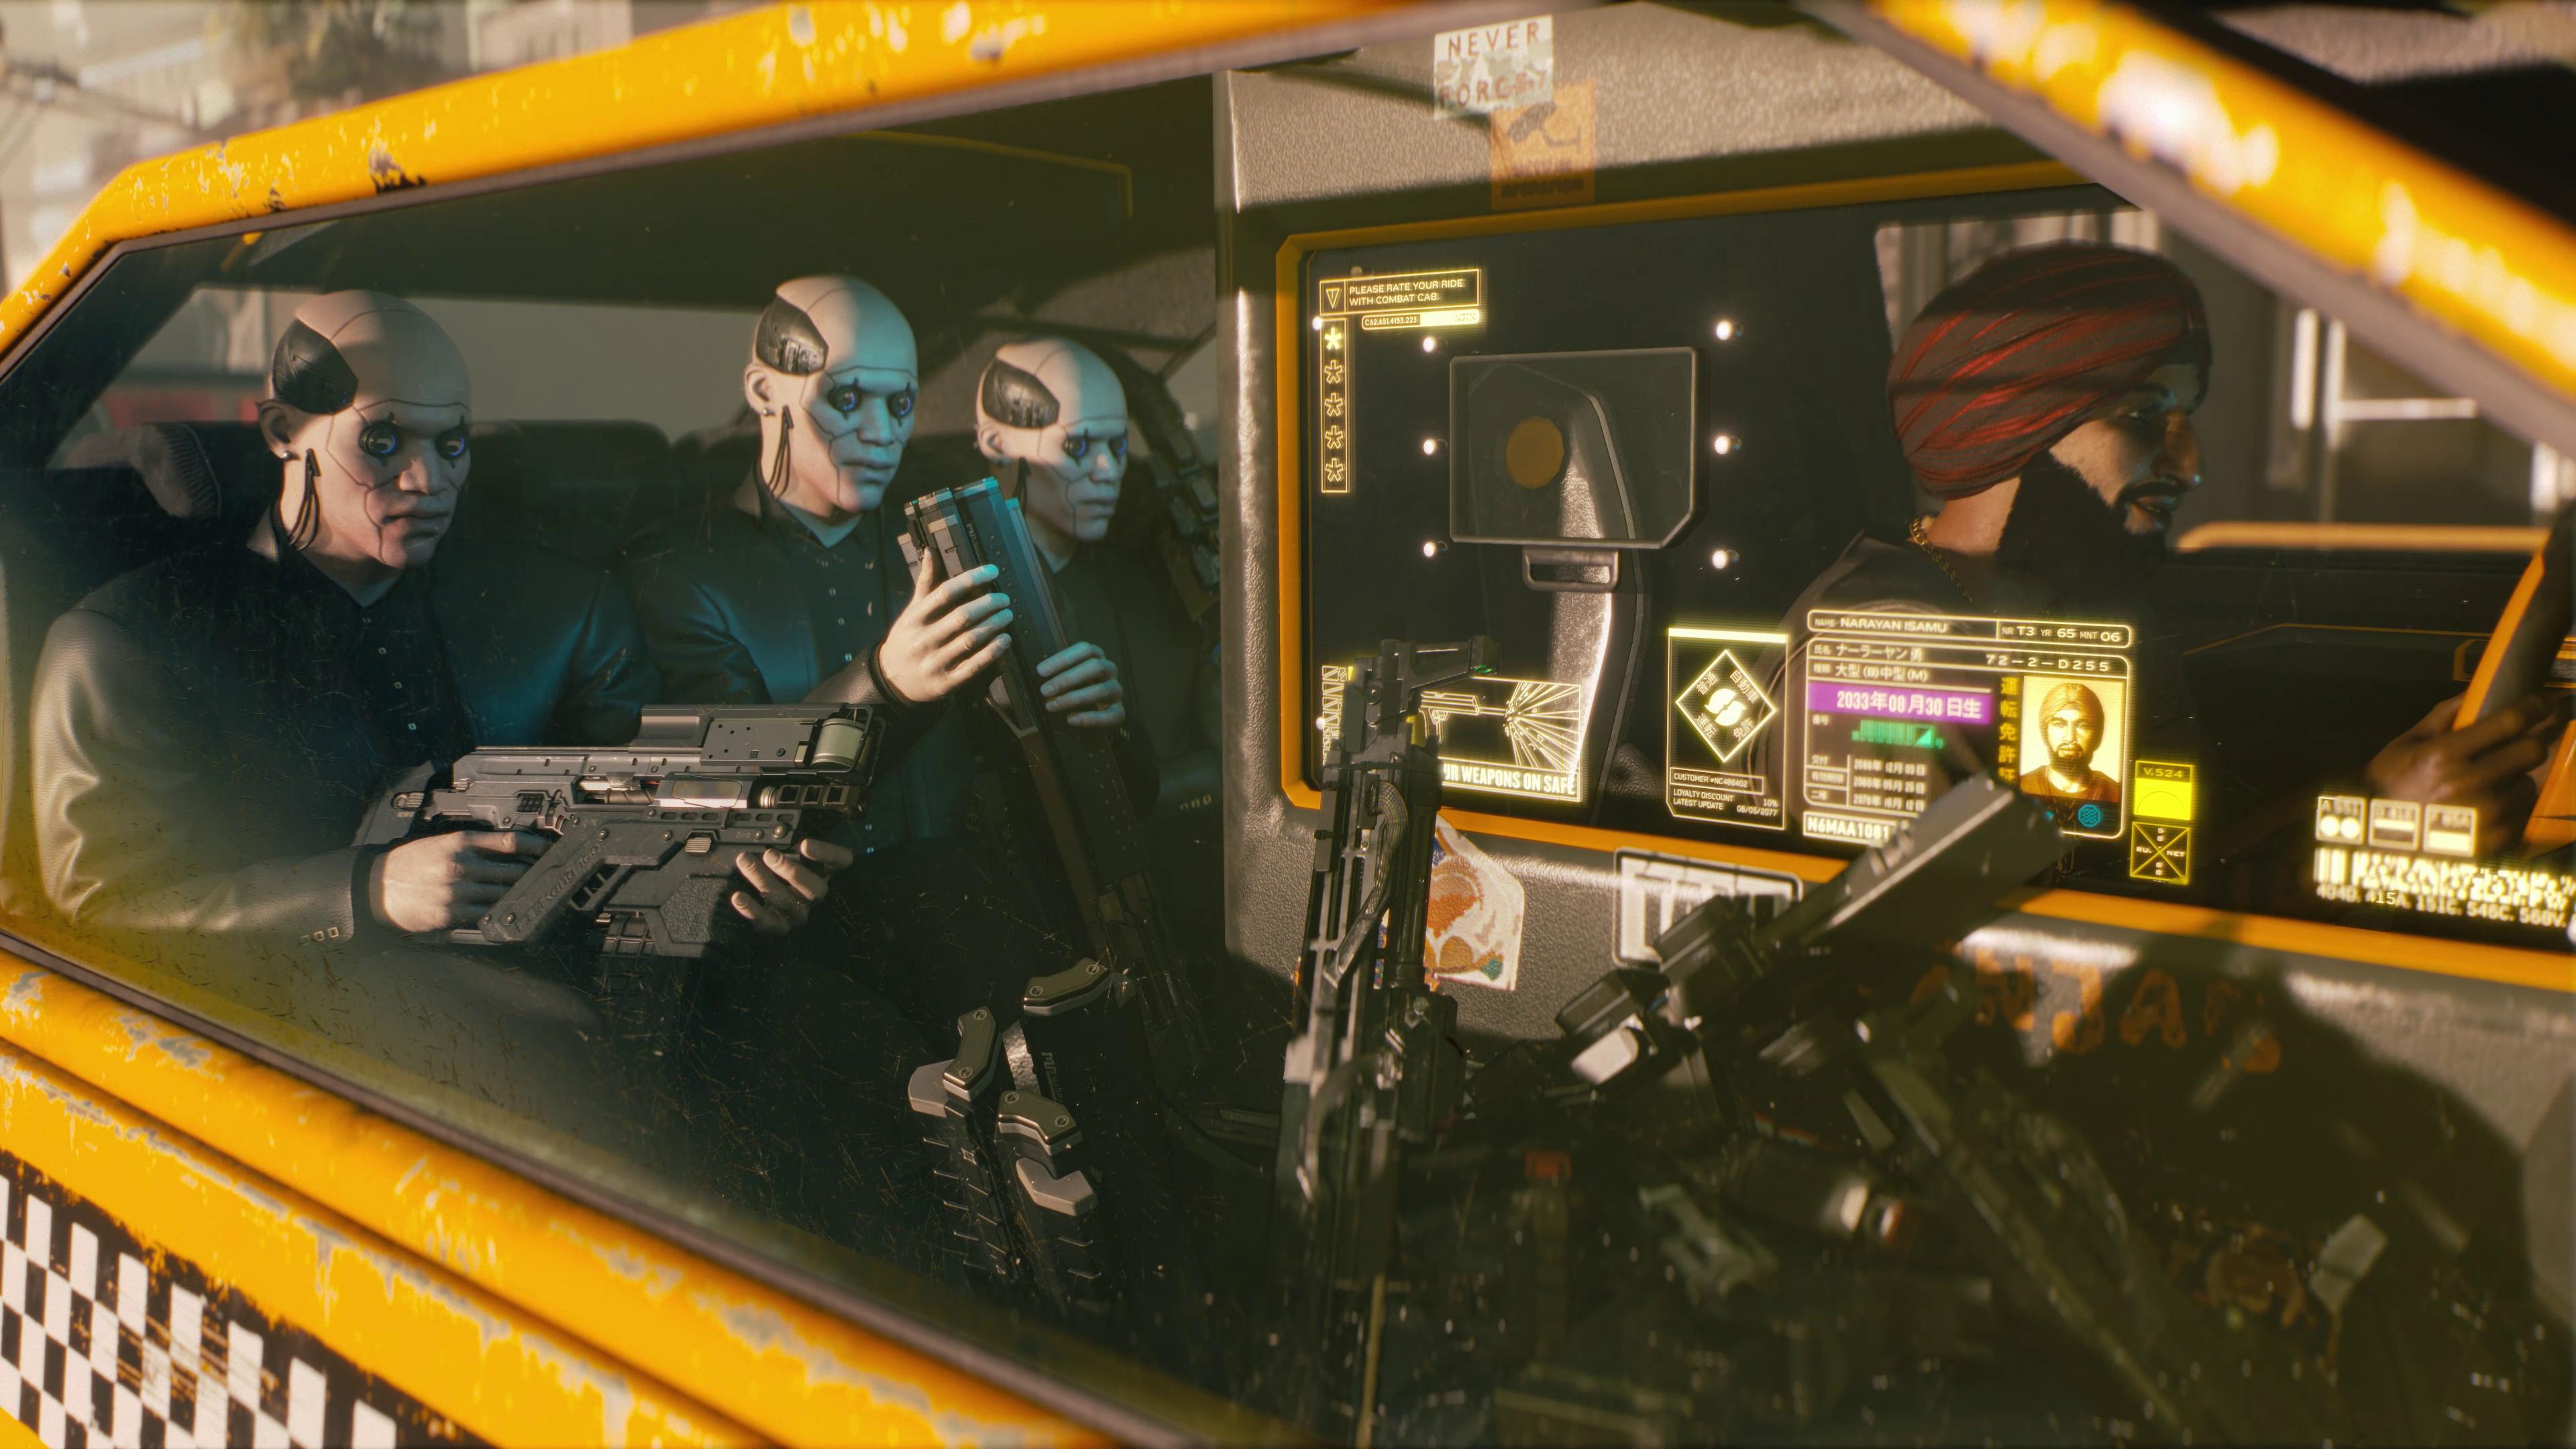 Cyberpunk 2077 has 400 people working on it | PC Gamer